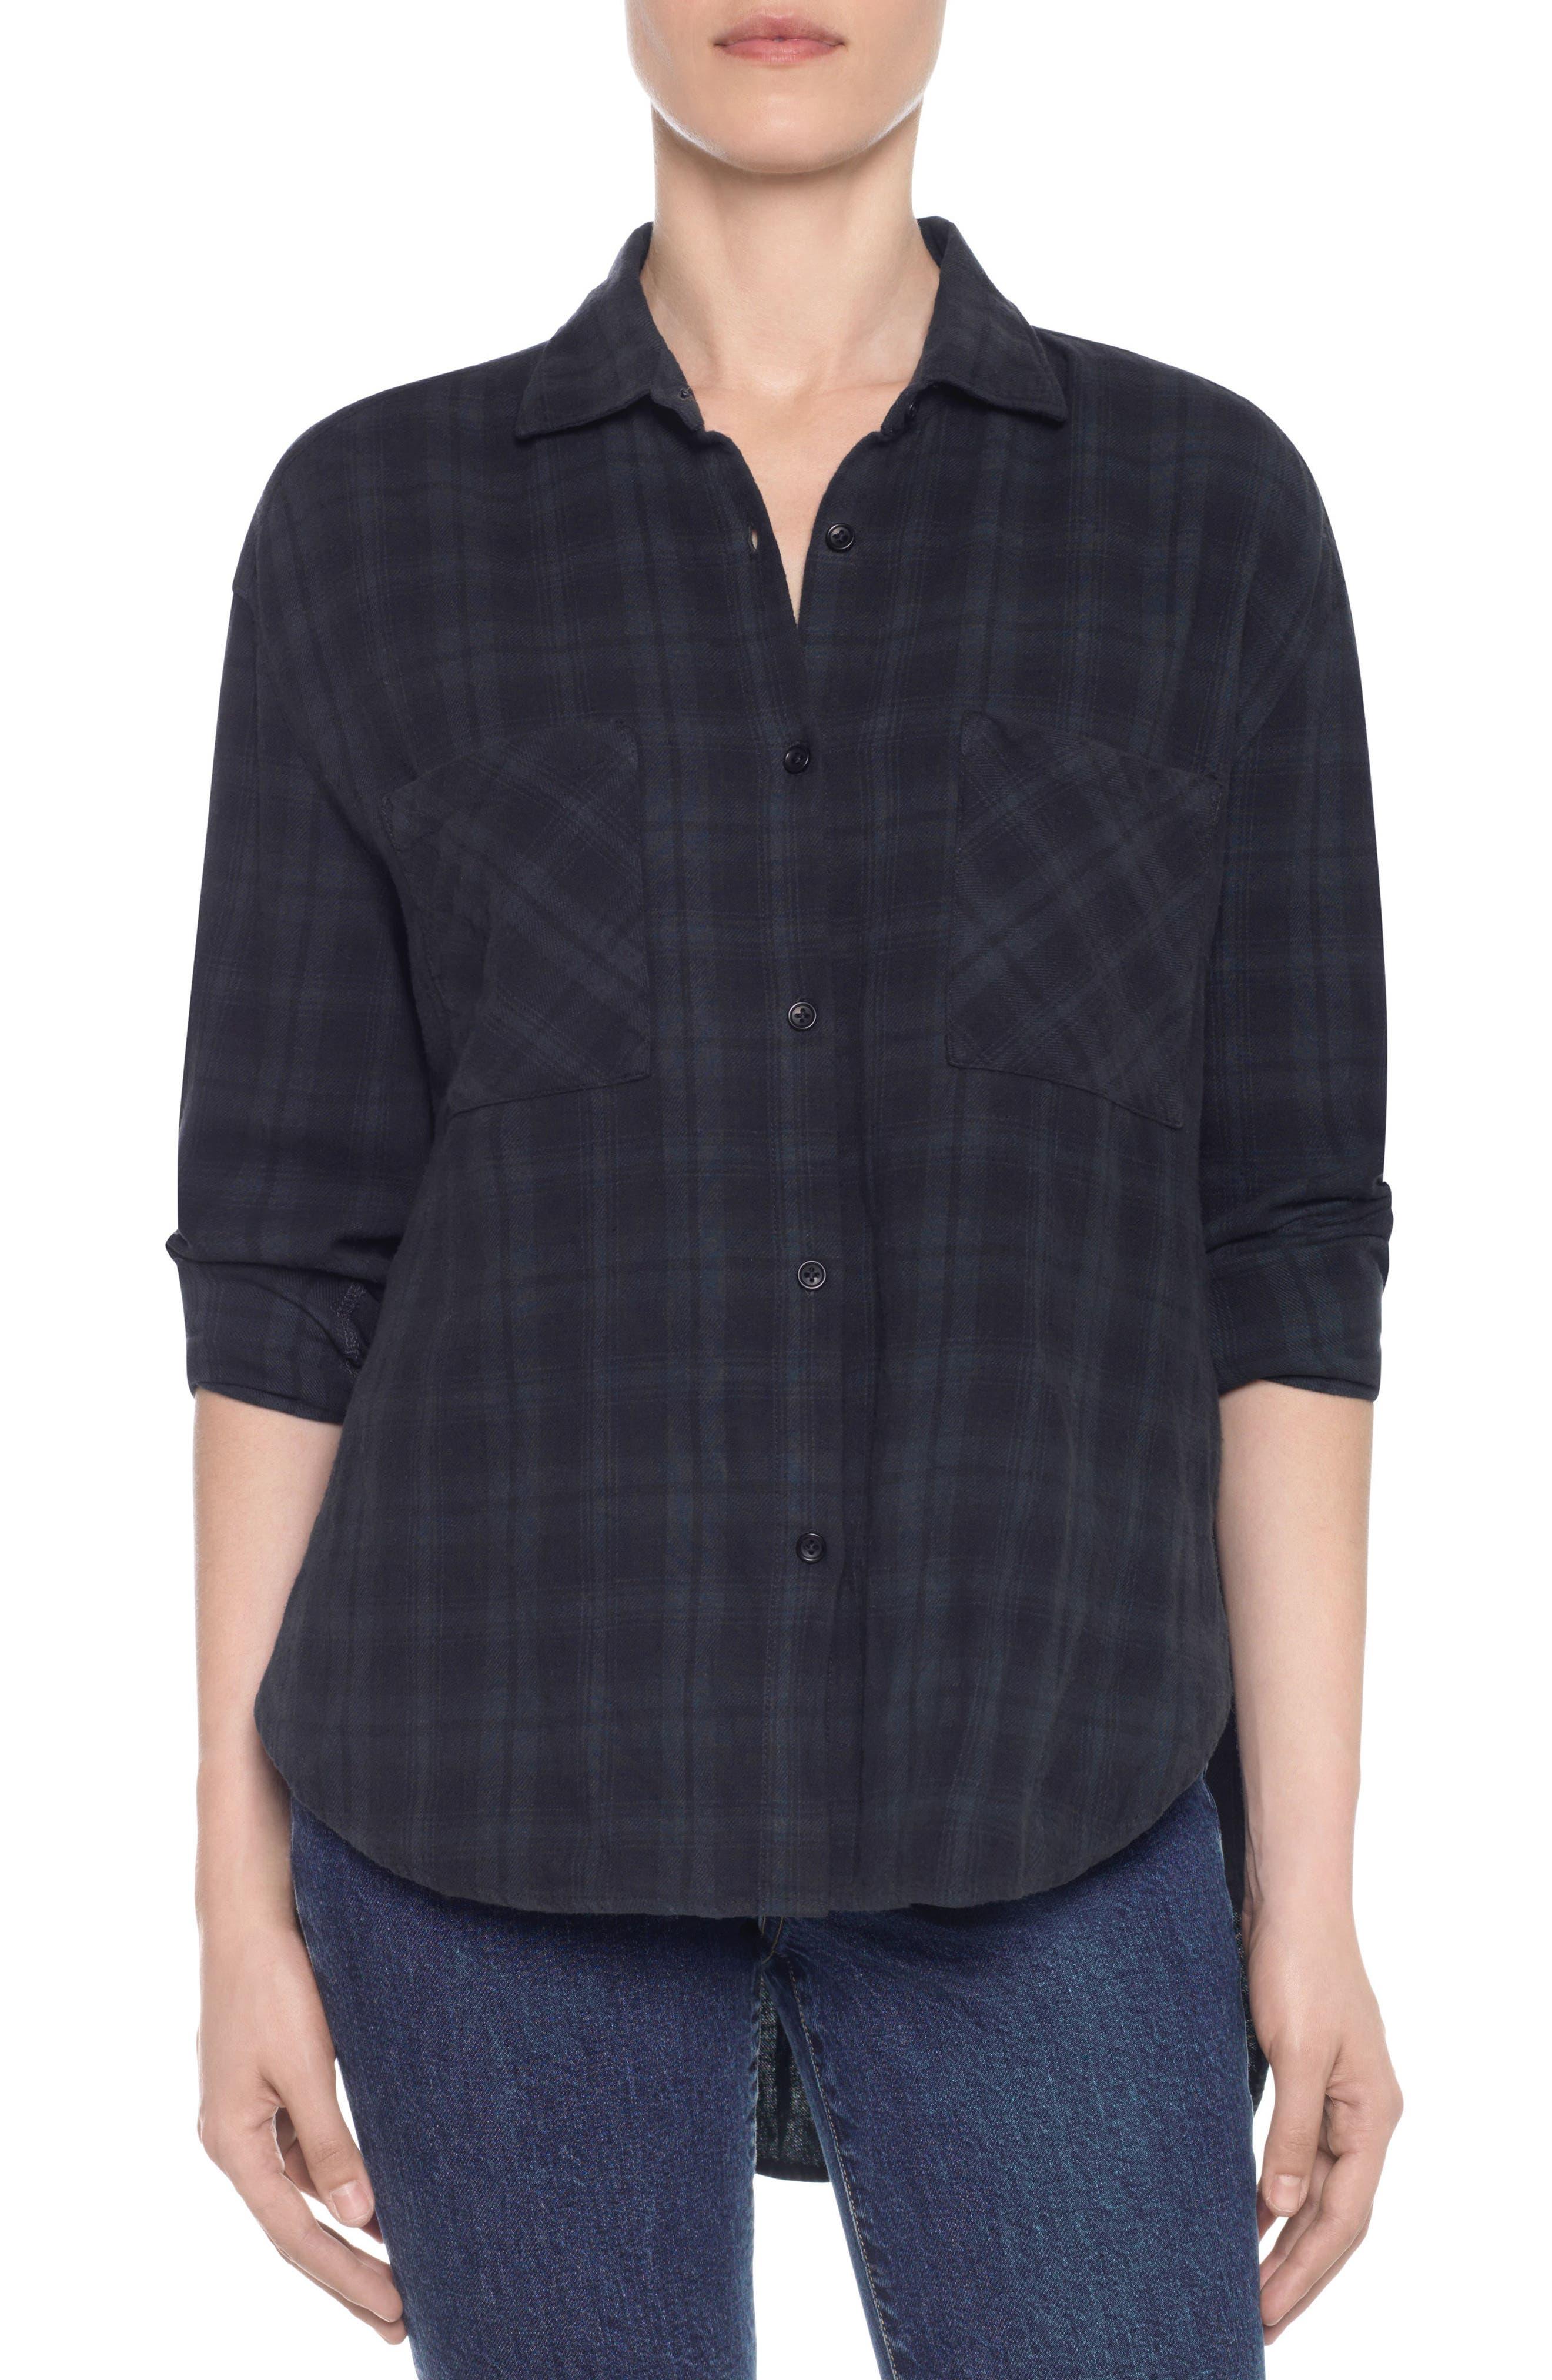 Taylor Hill x Joe's Boyfriend Flannel Shirt,                         Main,                         color, Twilight